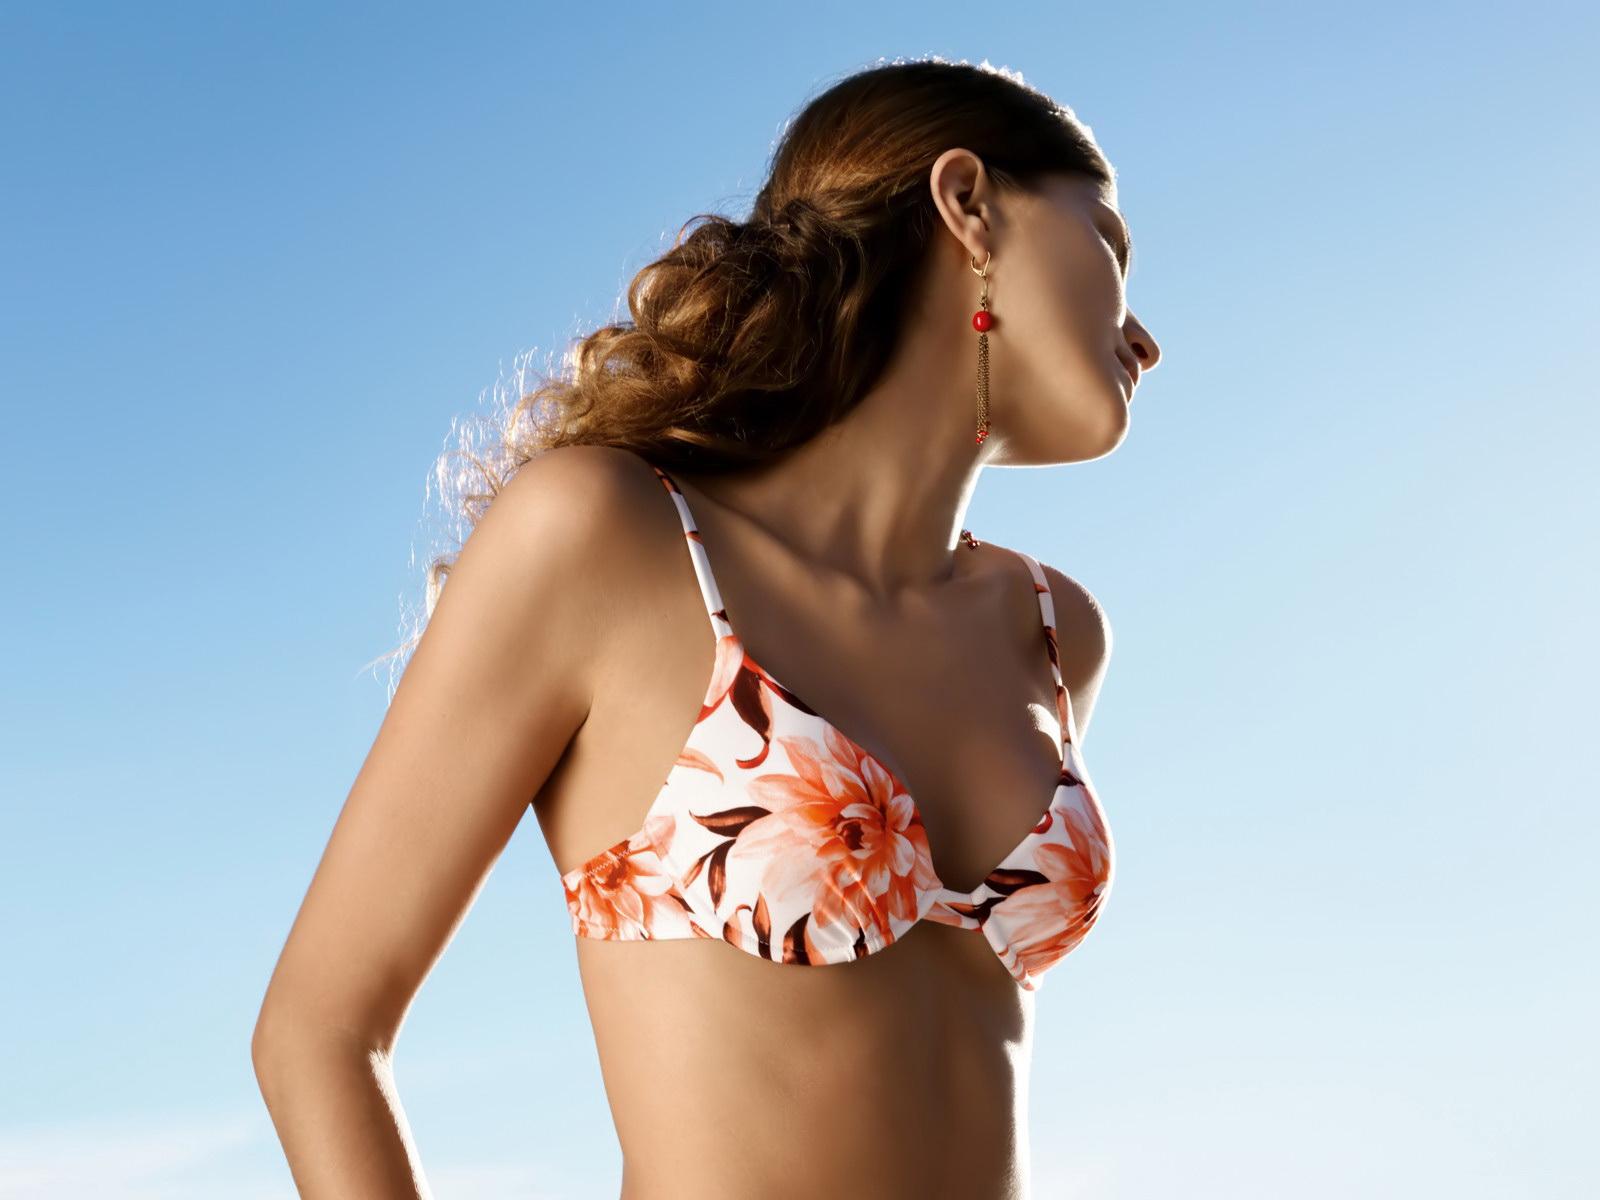 White, & orange flowered bikini top